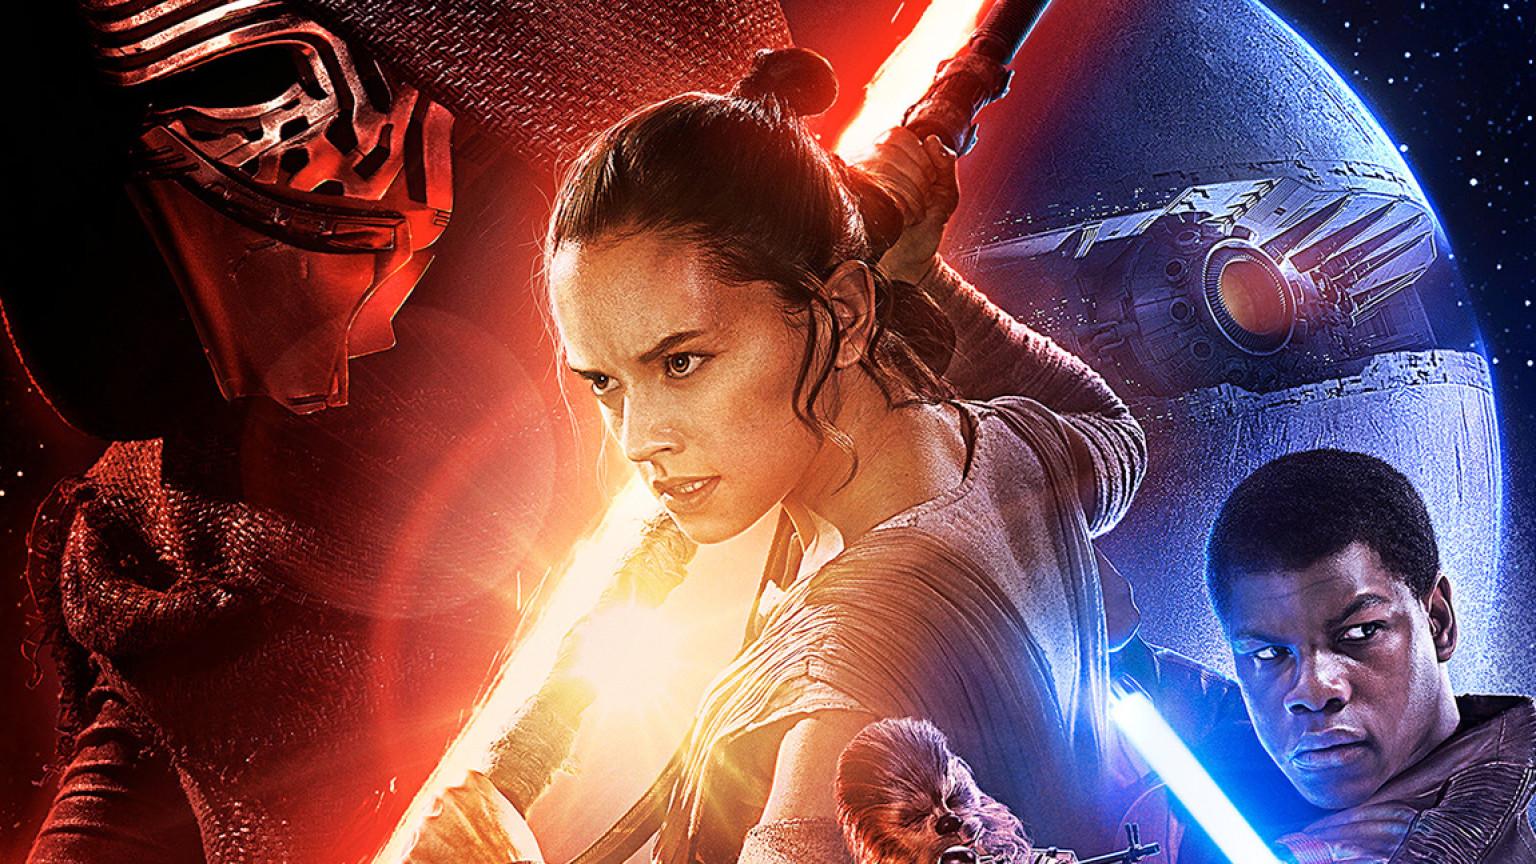 Download Wallpaper Halloween Star Wars - star-wars-force-awakens-official-poster-1536x864-336534116929  Gallery_100656.jpg